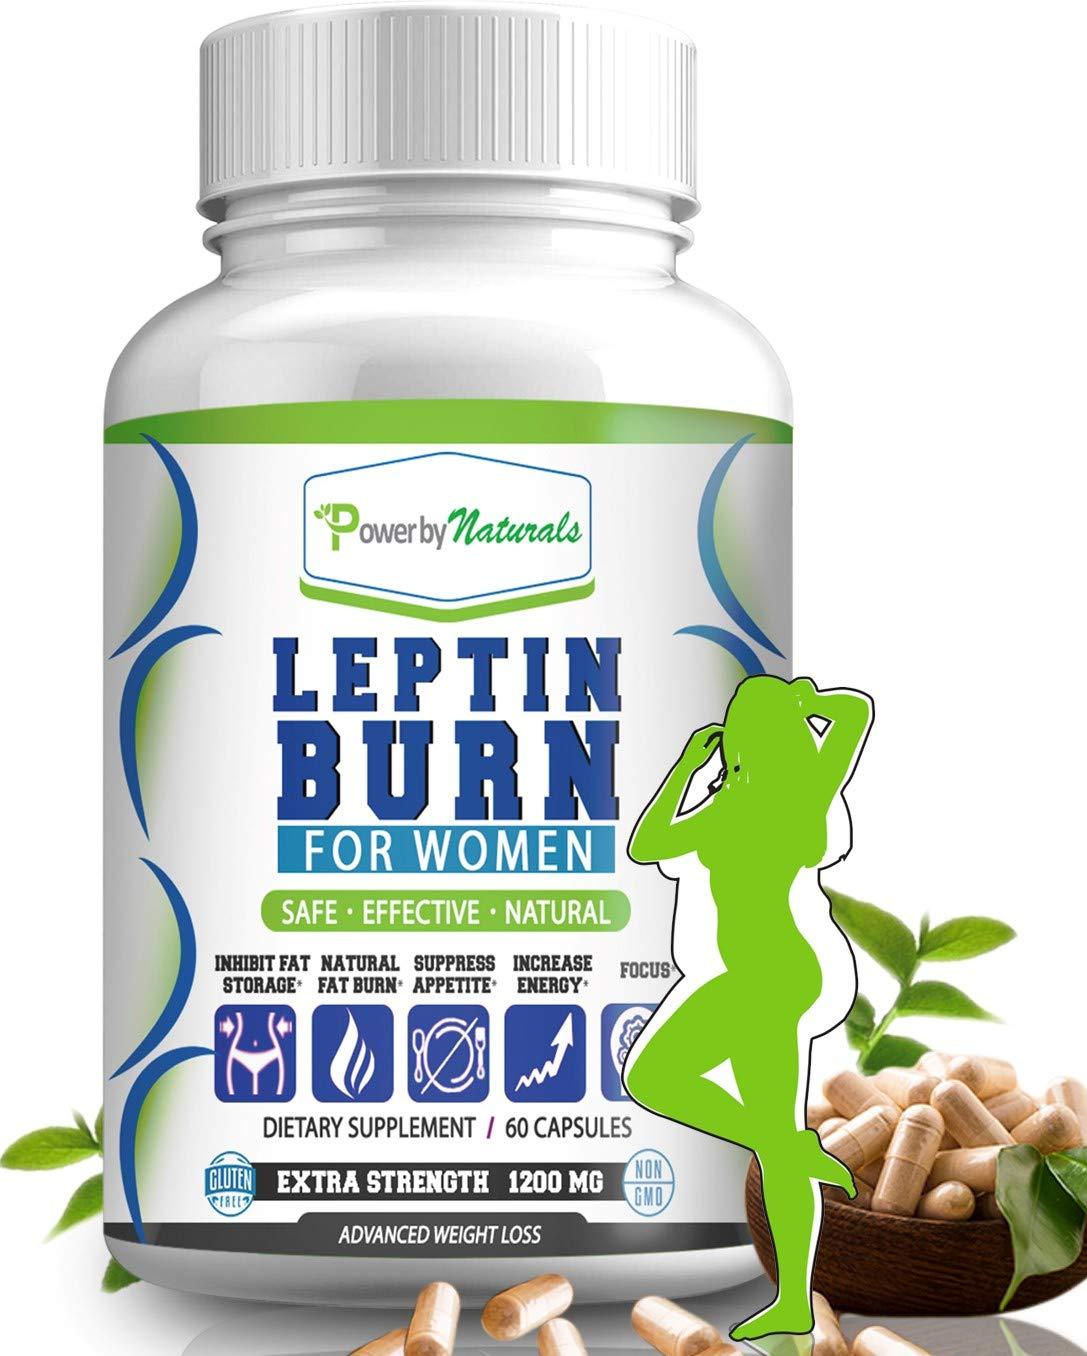 Organic Turmeric 1515mg Max Potency Supplement, 450mg Curcuminoids, 15mg BioPerine – – Anti-Inflamatory, Antioxident, Skin Health, Improves Brain Function, Anti-Depressant.